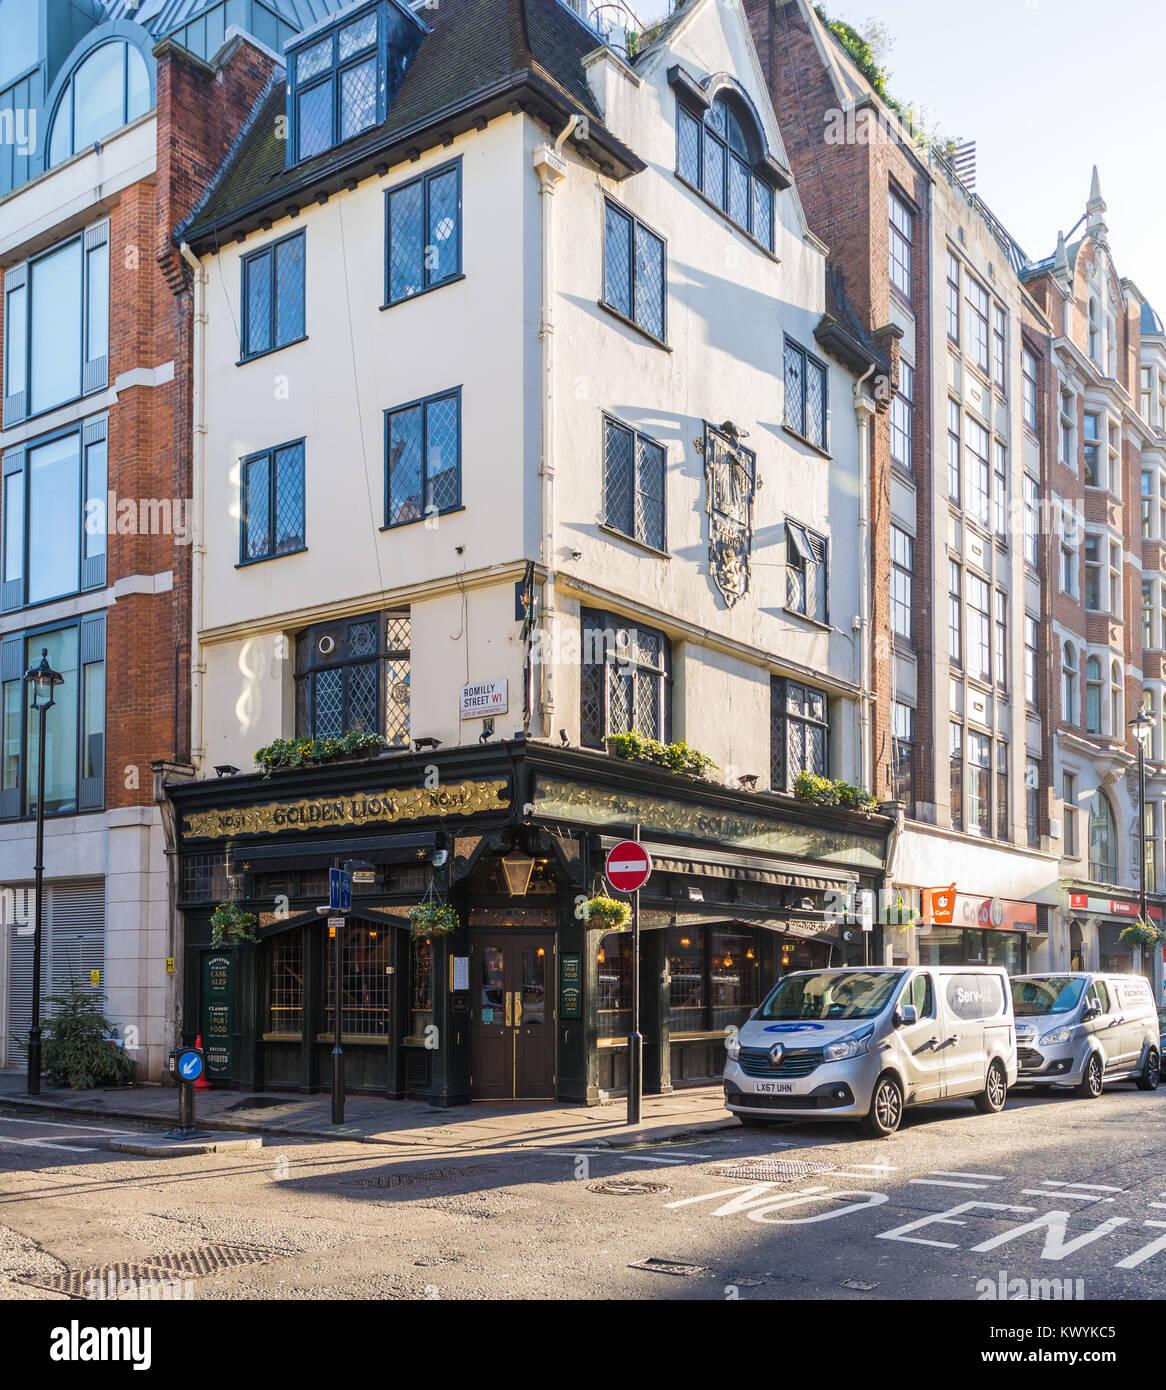 The Golden Lion pub in Dean Street, Soho, London, England, UK. - Stock Image